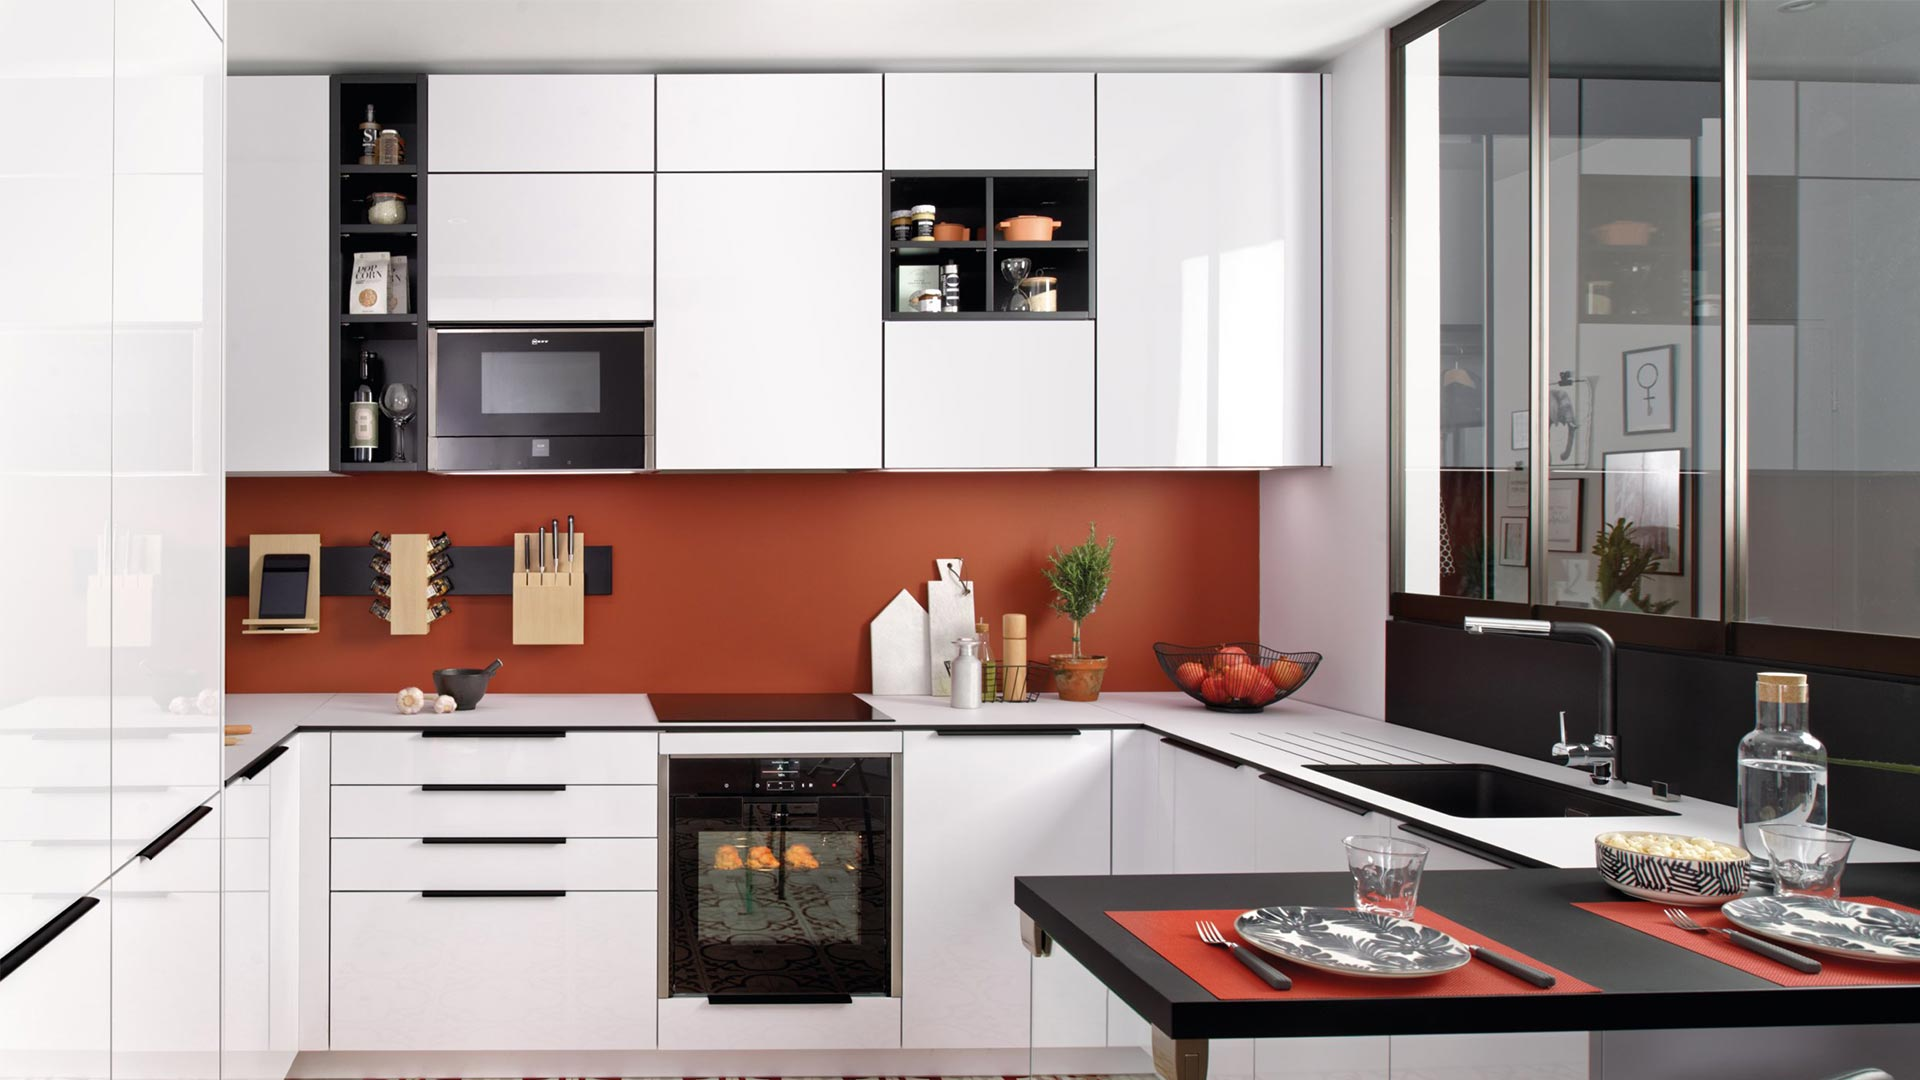 cuisine petit espace design avec verrières